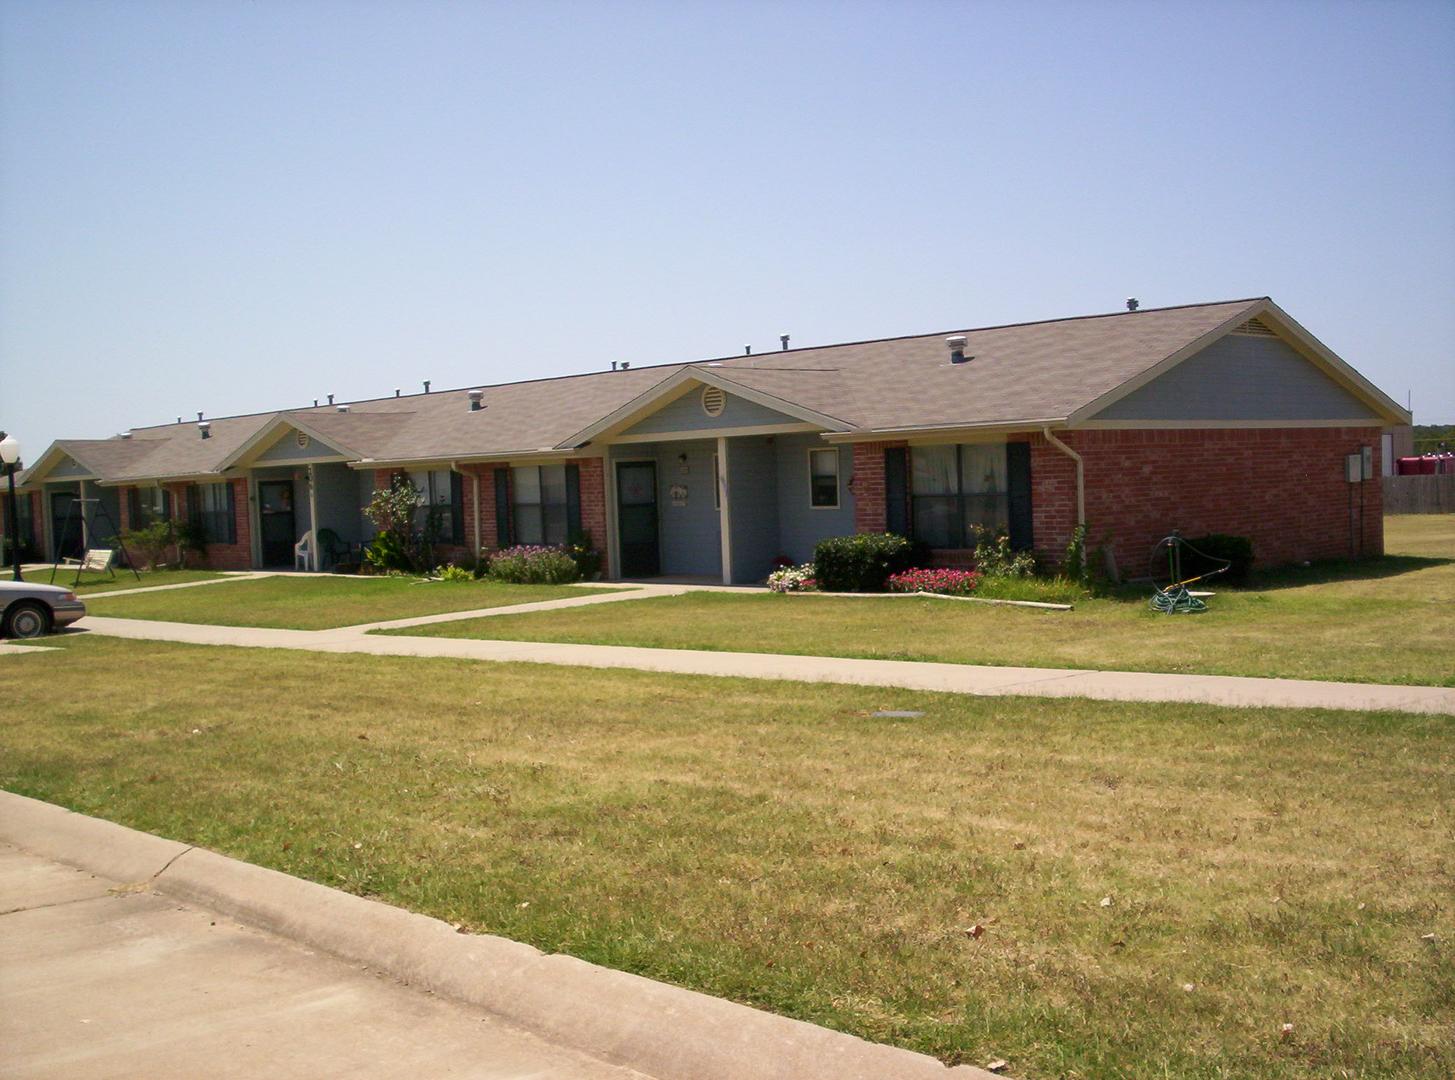 Image of Stroud Senior Village in Stroud, Oklahoma